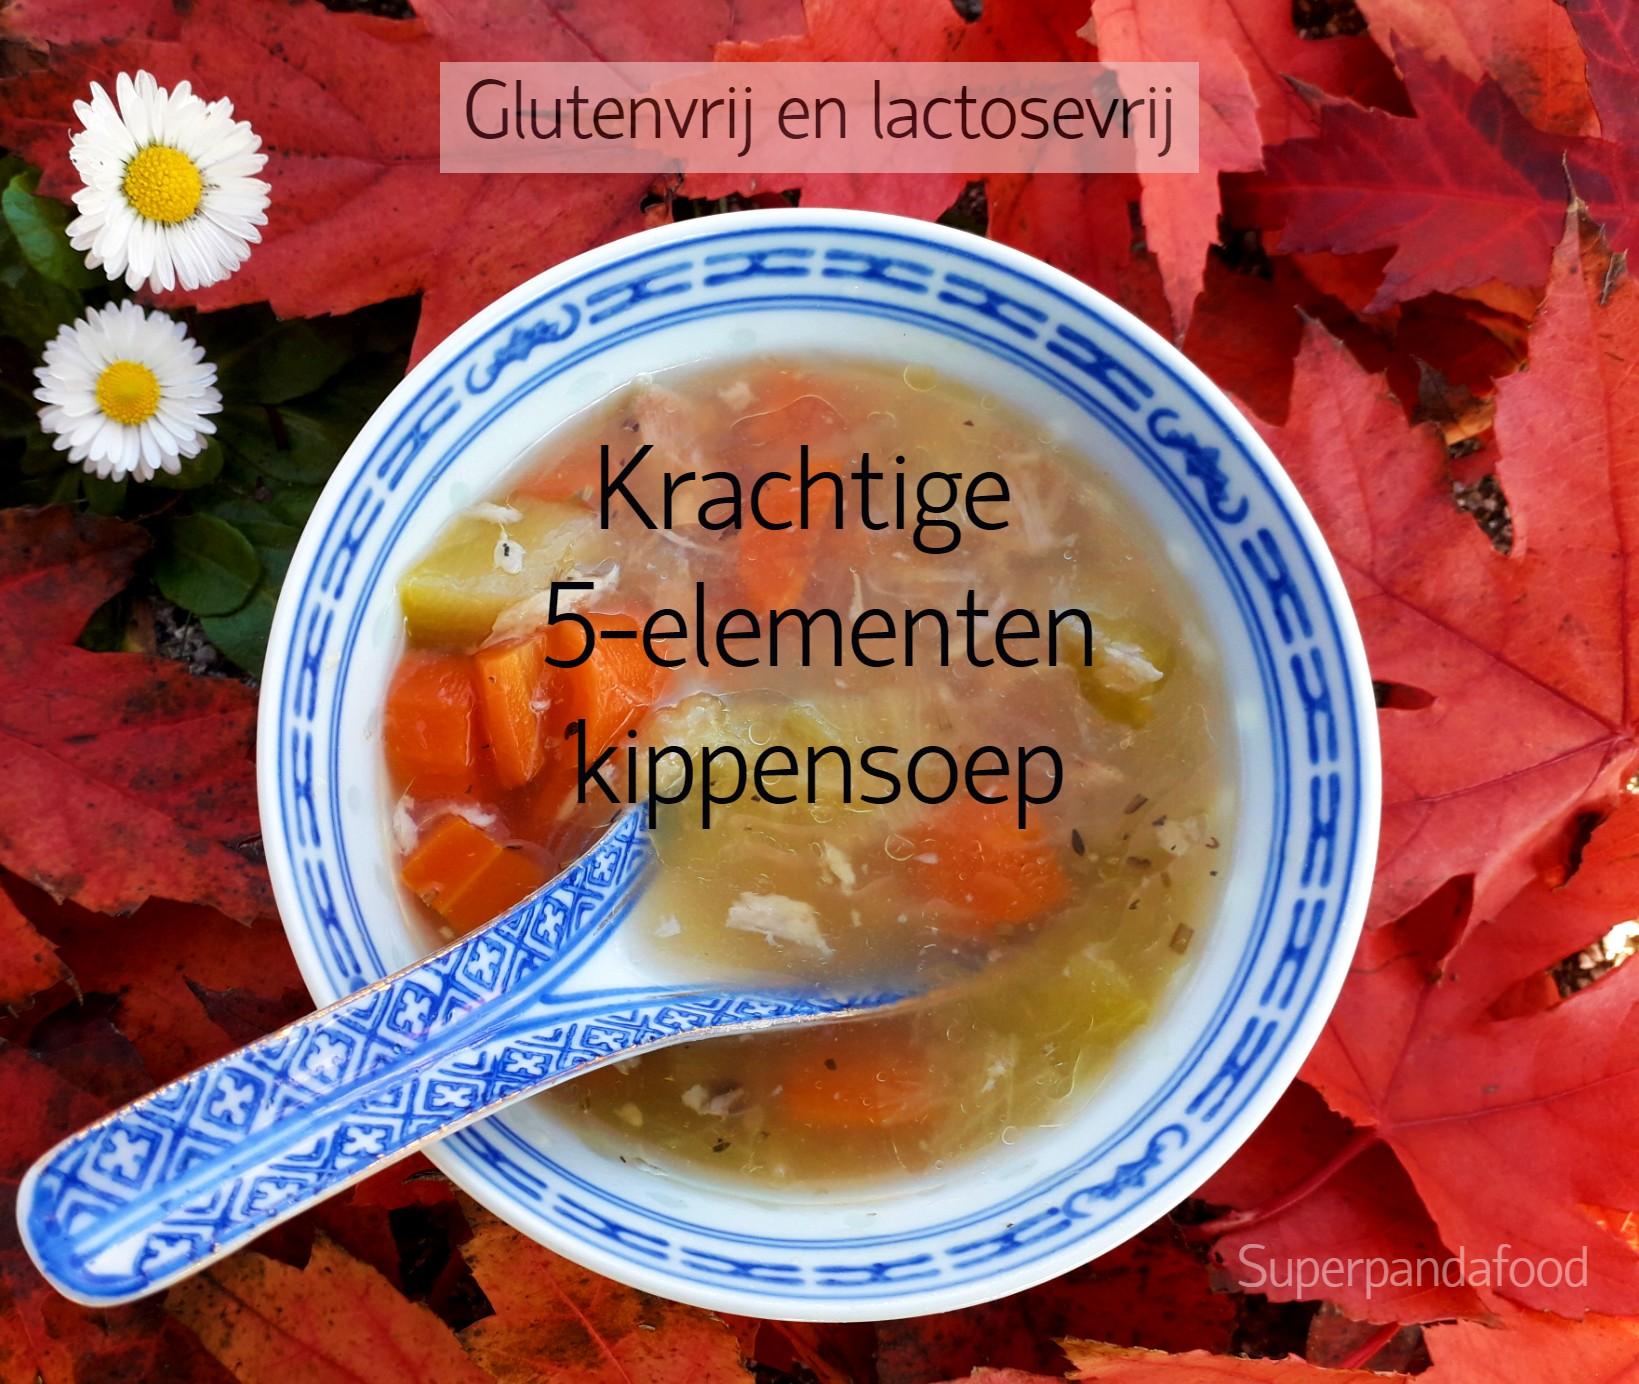 Krachtige 5-elementen kippensoep - glutenvrij en lactosevrij recept